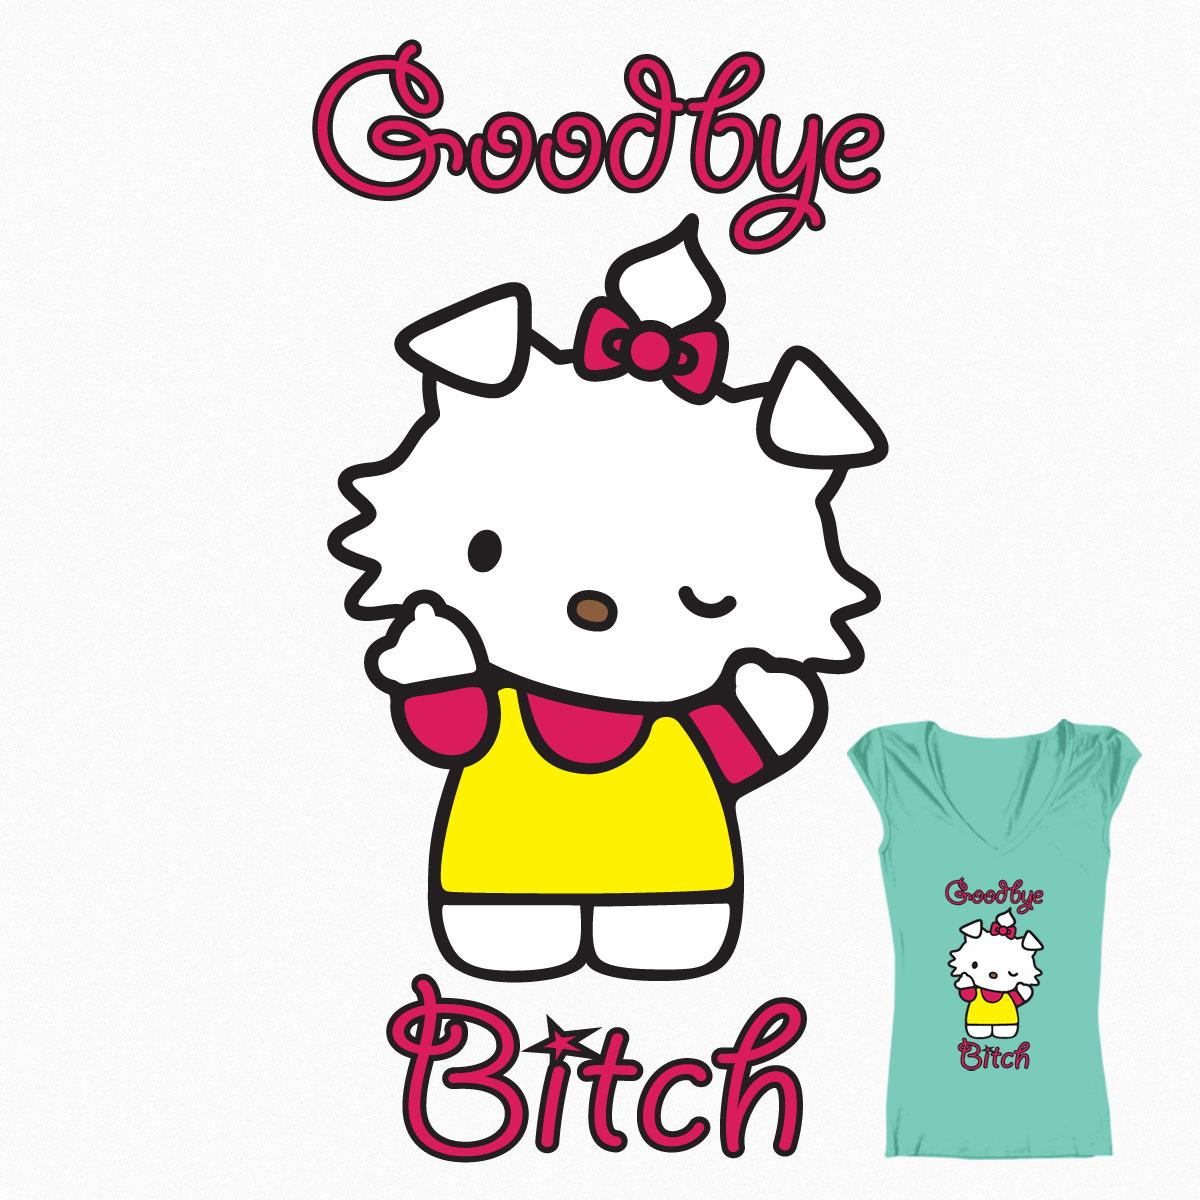 Goodbye Bitch by Bluelefant on Threadless